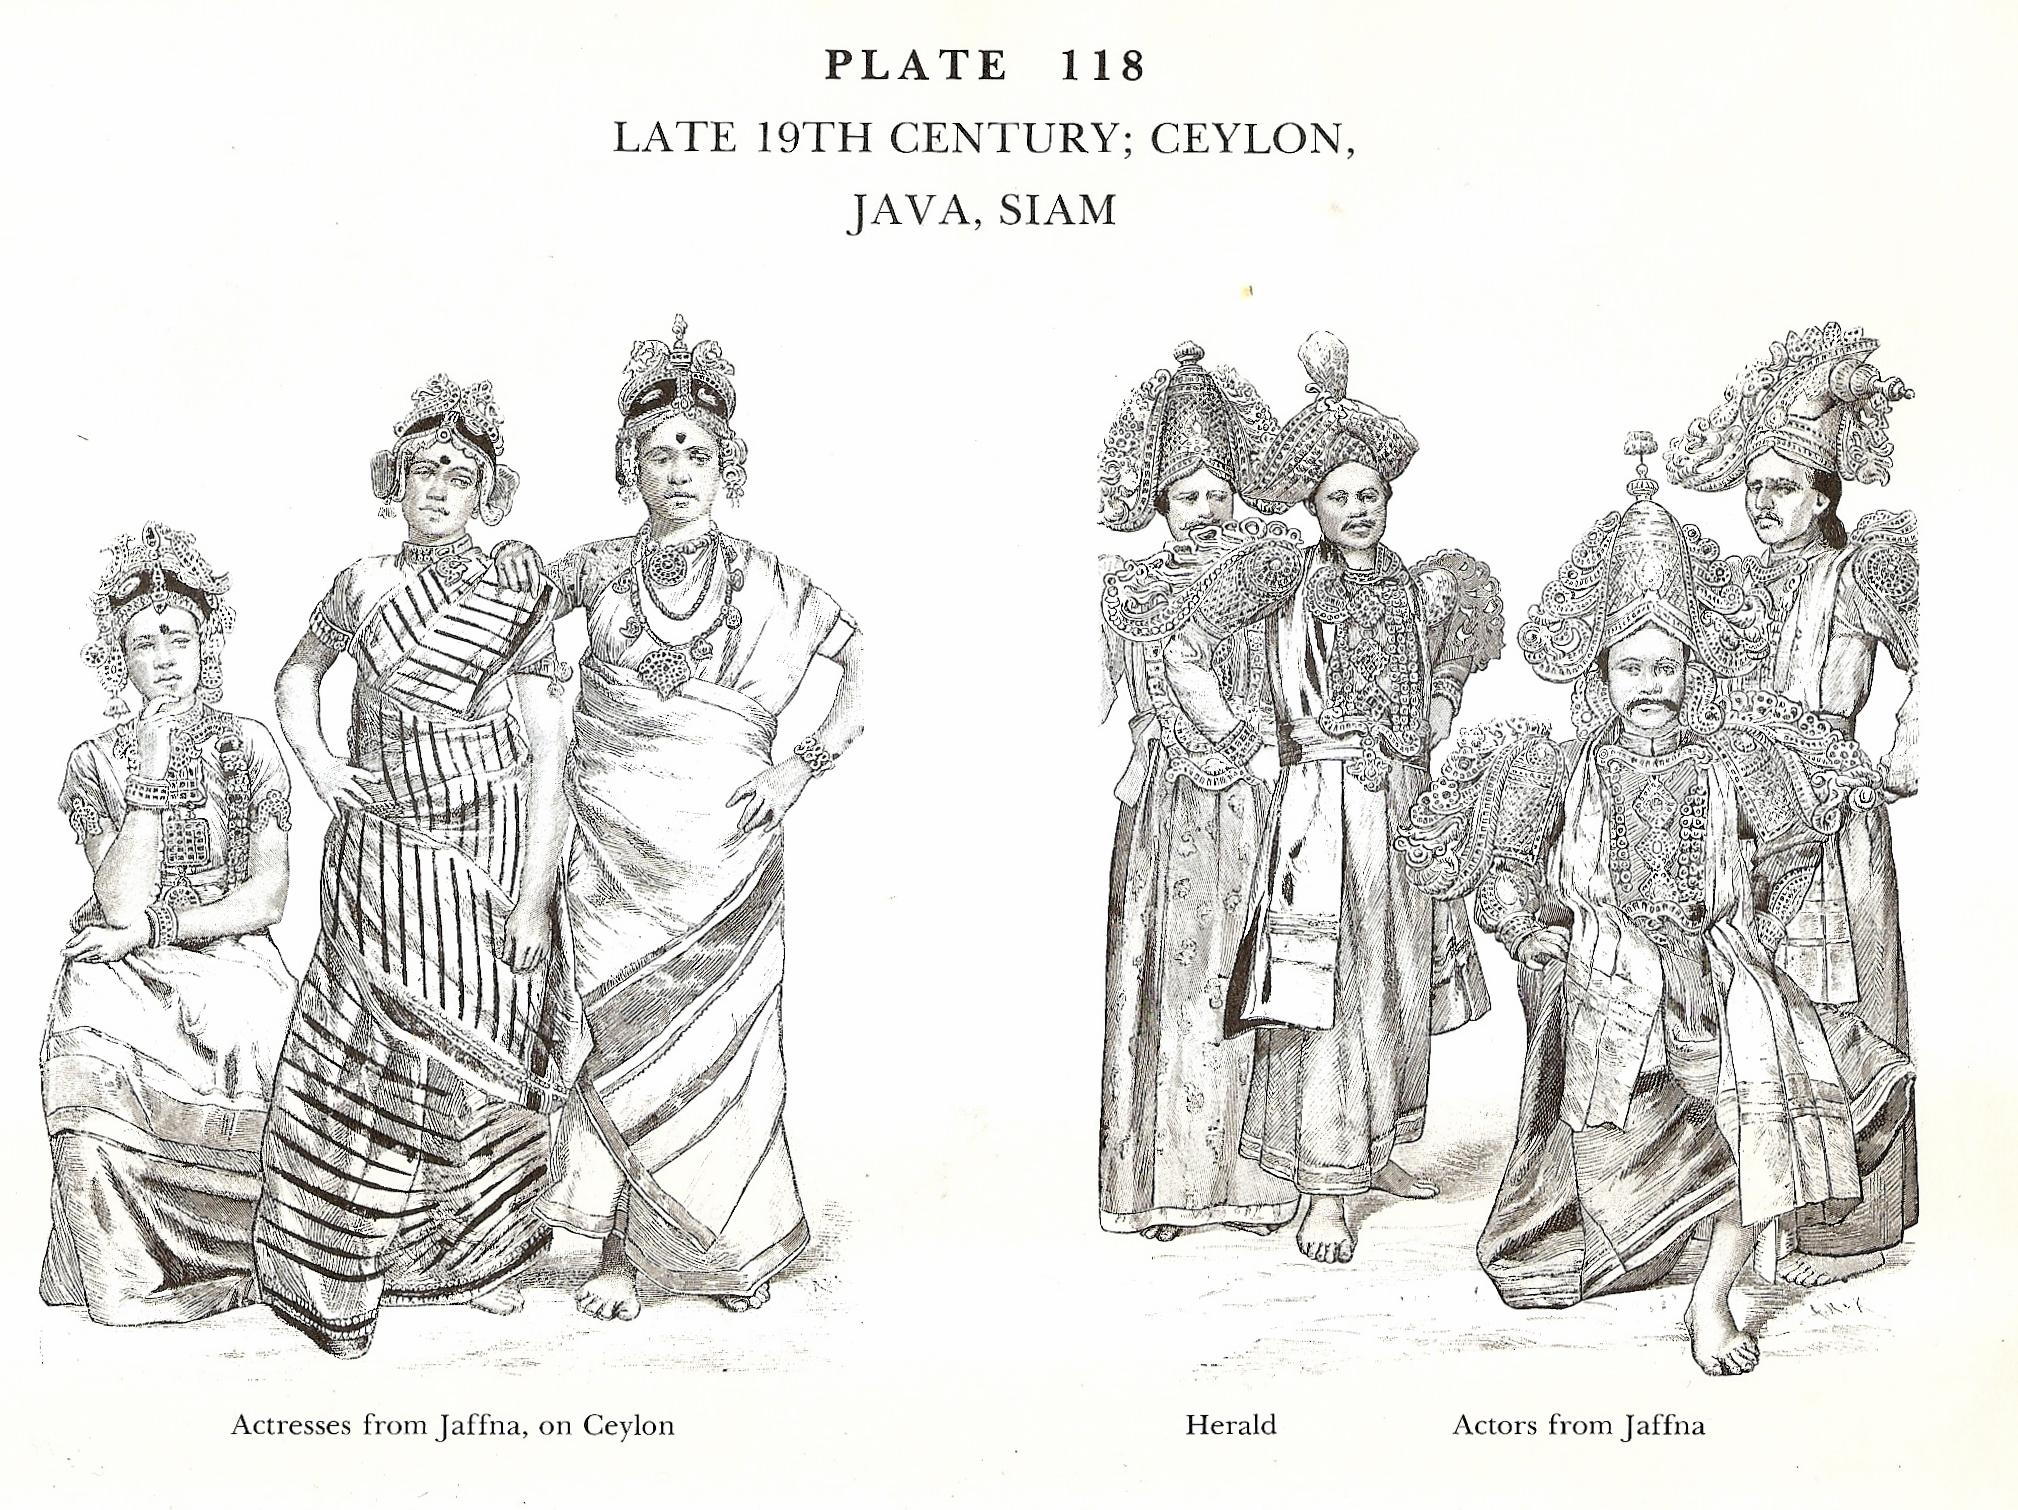 Late 19th Century Ceylon, Java, Siam